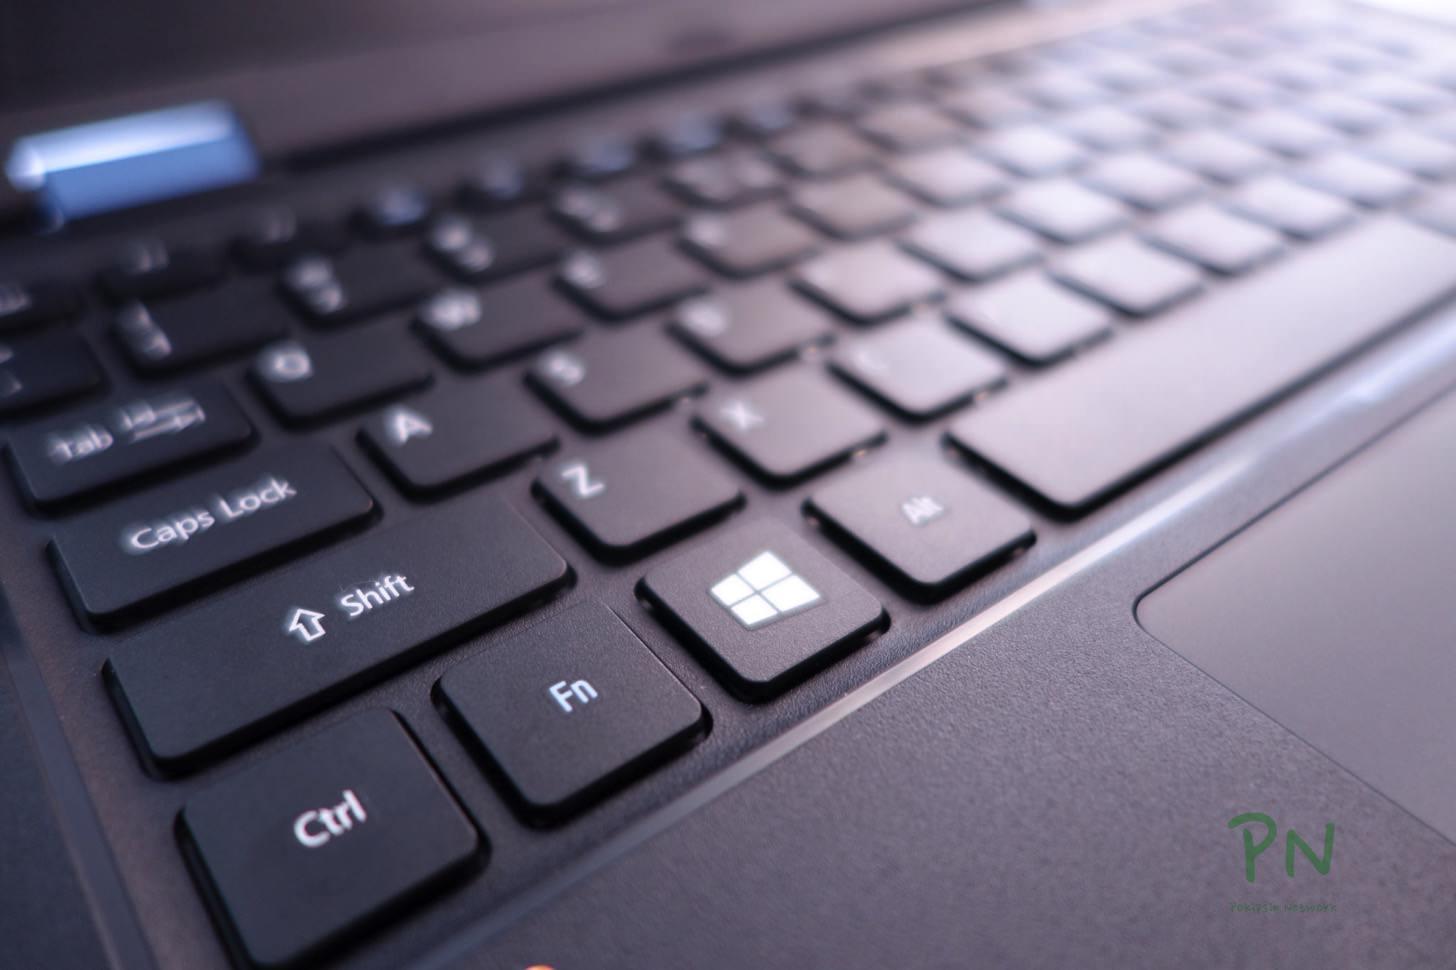 Windowsのキーボード